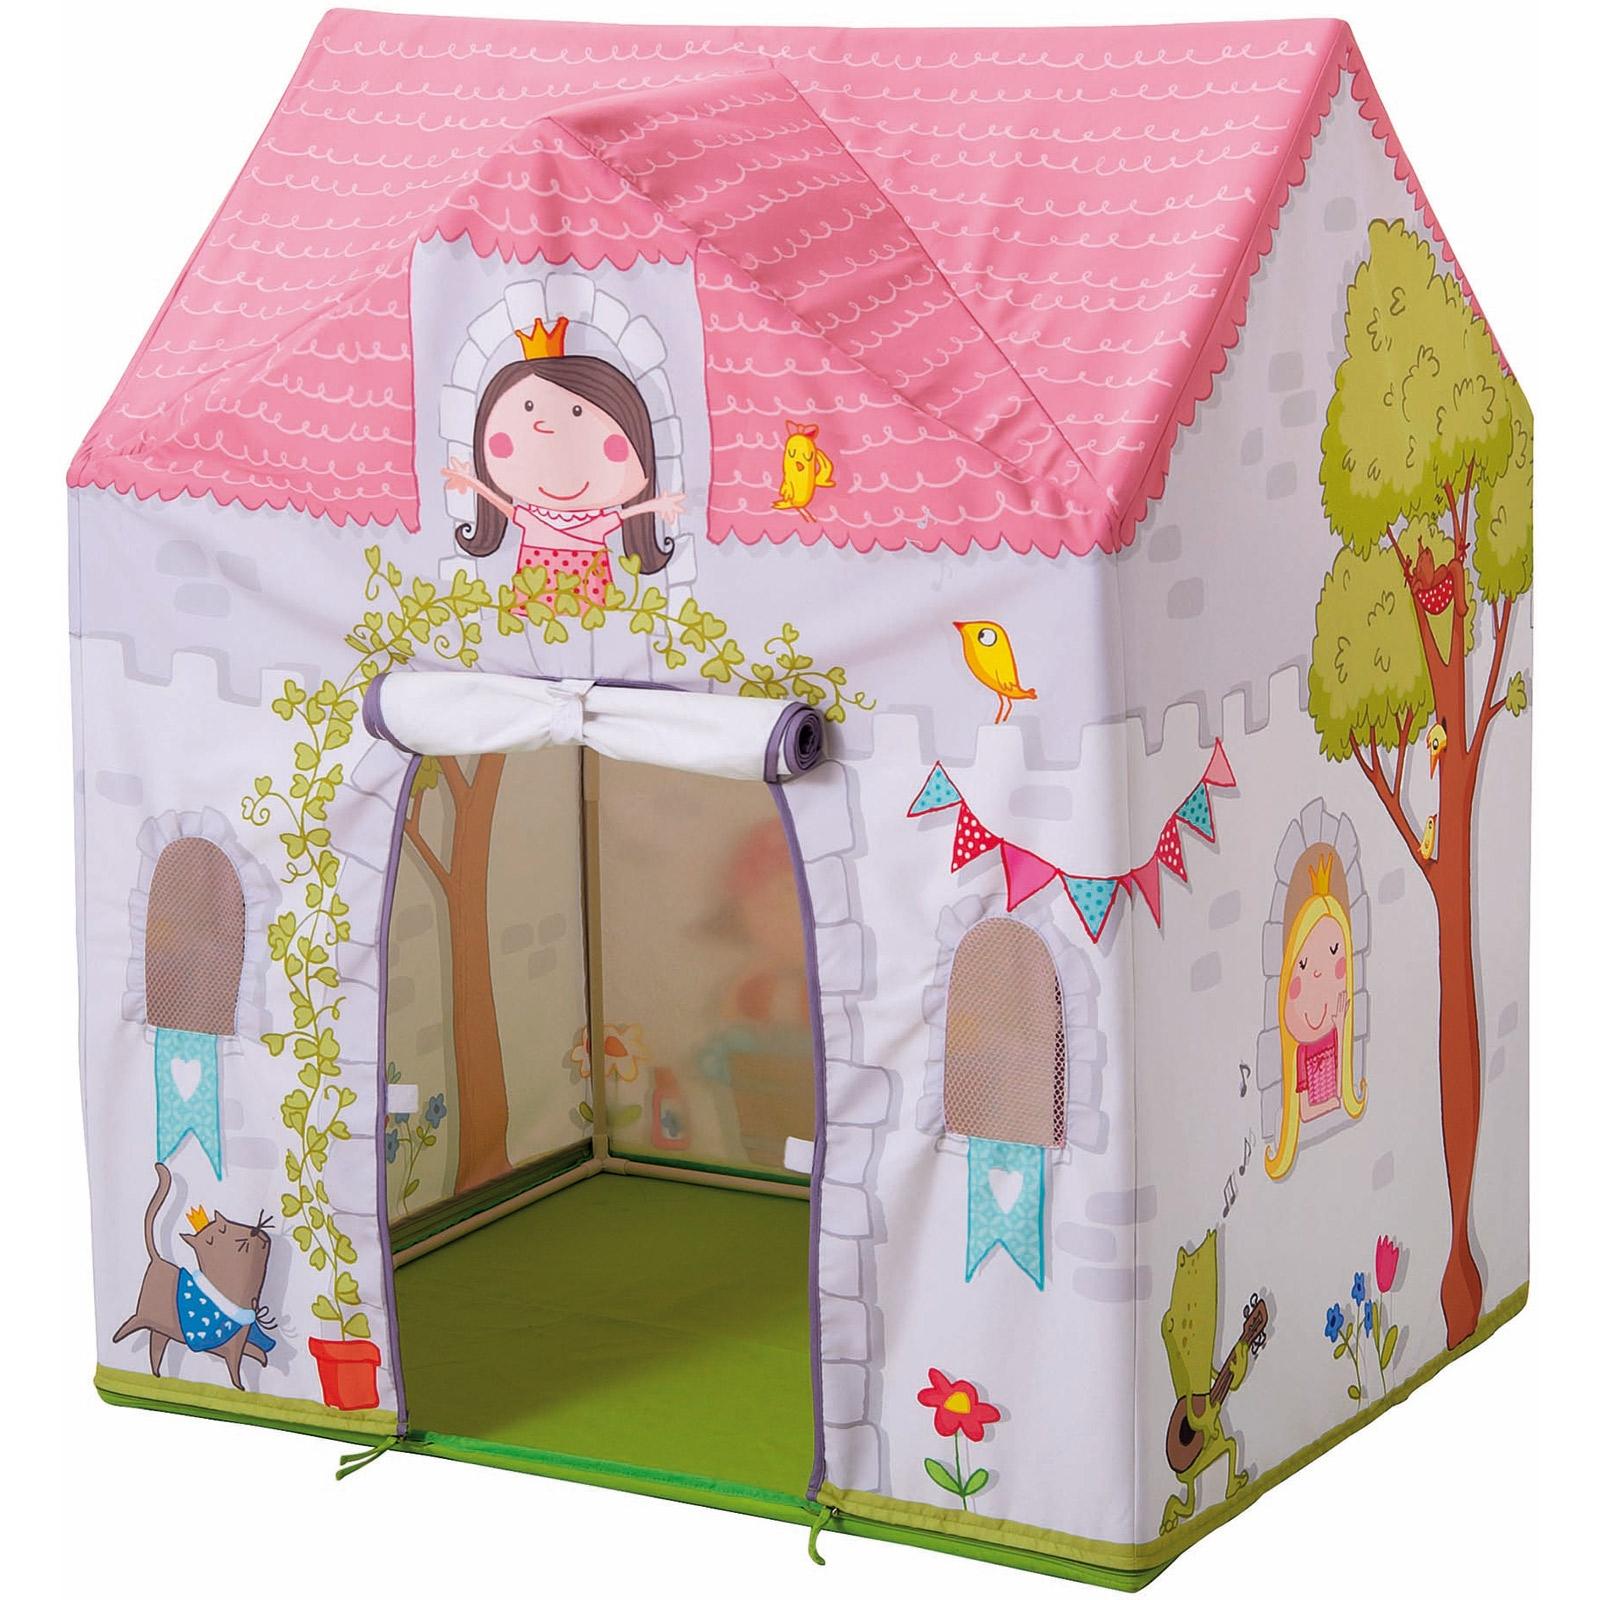 Tente Chambre Garcon concernant tente de jeu princesse rosalina : haba - berceau magique